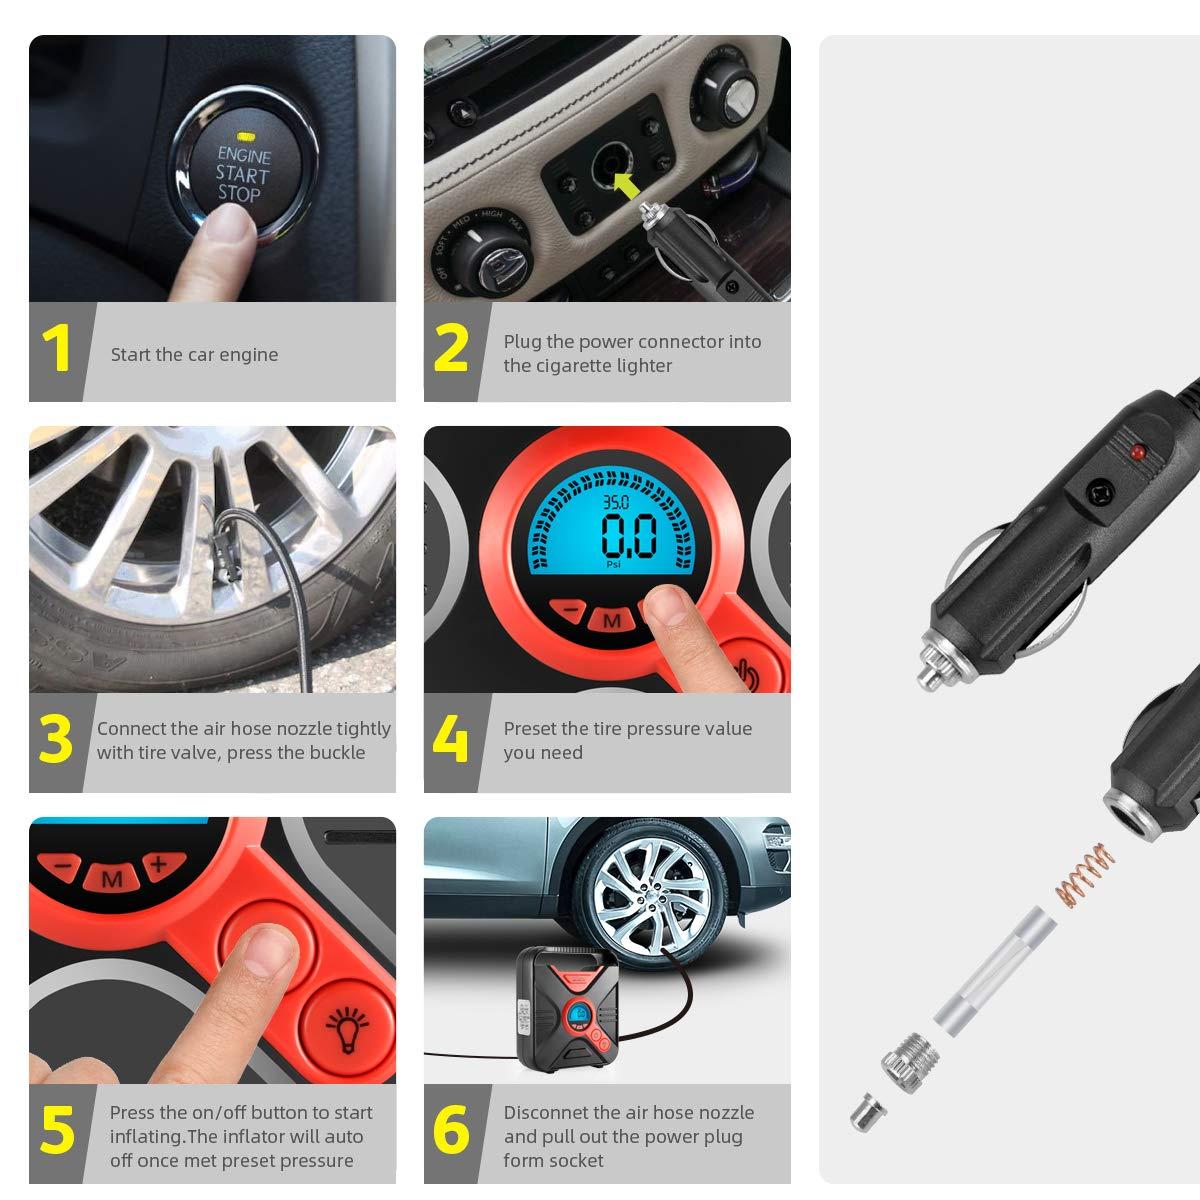 WindGallop Car Tyre Inflator Air Compressor Tyre Pump 12V Electric Car Air Pump for Car Tyres Bike Tyres with Digital Tyre Pressure Gauge and Inflator Valve Adaptors LED Light (Red)